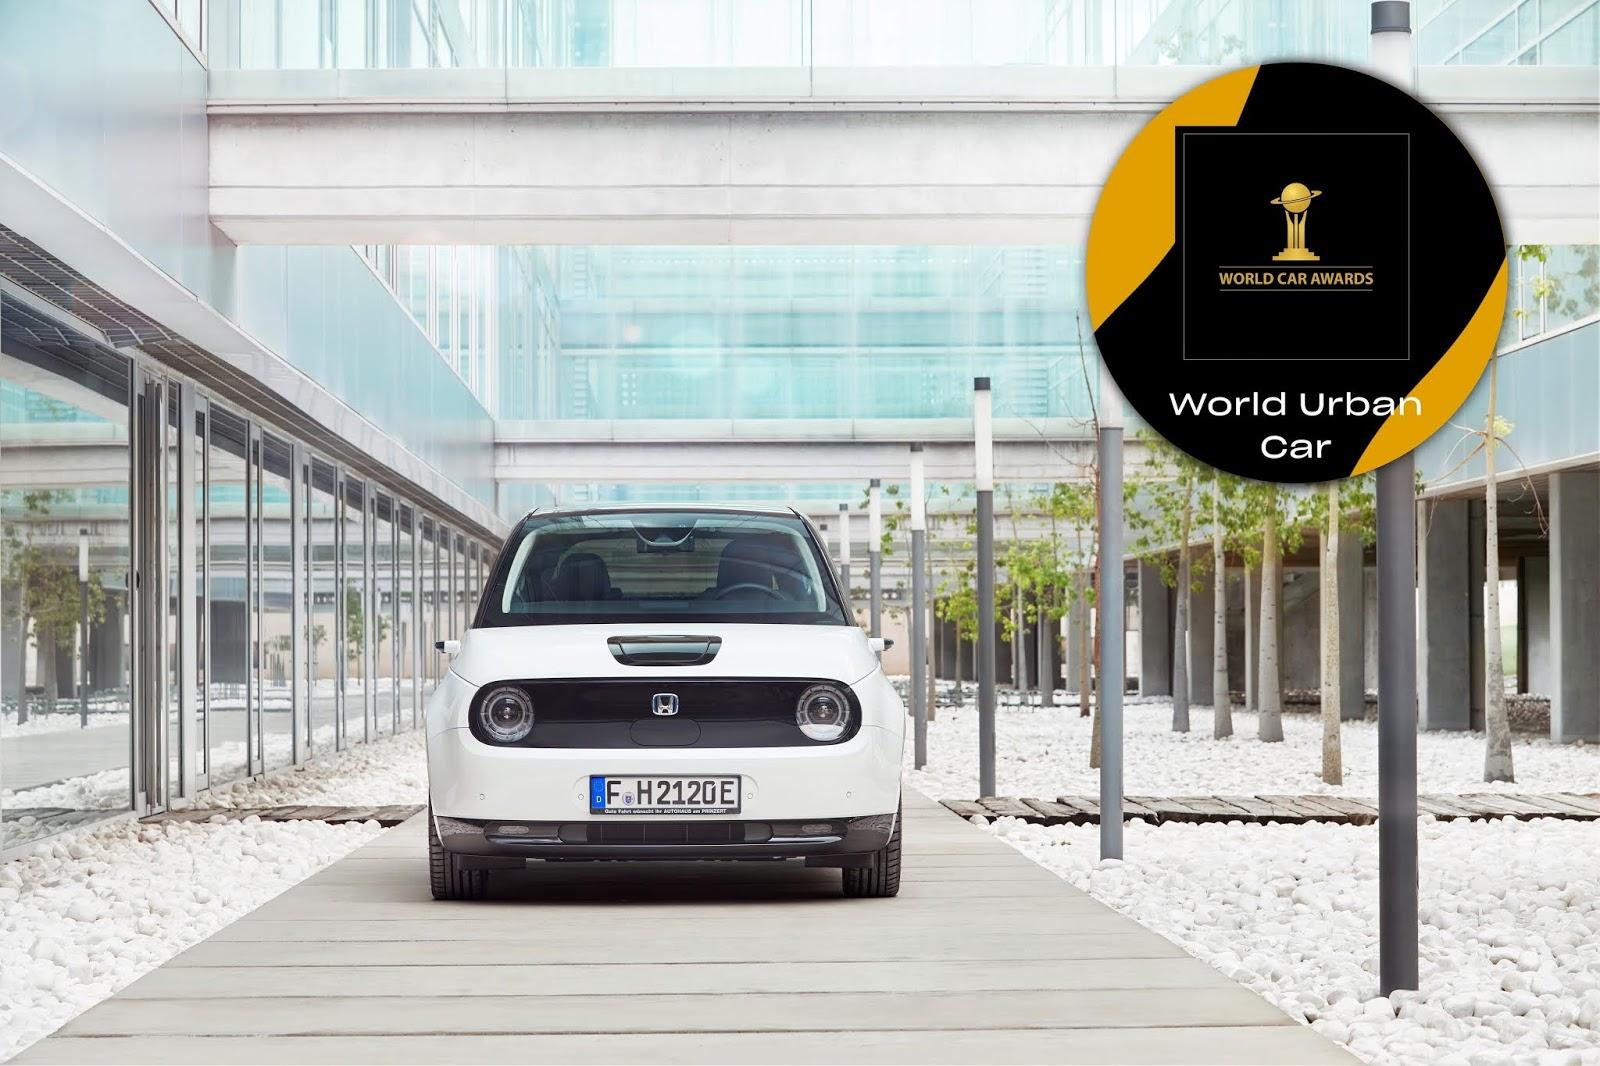 331860 HONDA e TRIUMPHS AT 2021 WORLD CAR AWARDS 1 Honda e : Θριάμβευσε Στα 2021 World Car Awards 2021 World Car Awards, Electric cars, electric vehicles, Honda, Honda e, World Car Awards, ειδήσεις, ηλεκτρικά, ηλεκτροκινηση